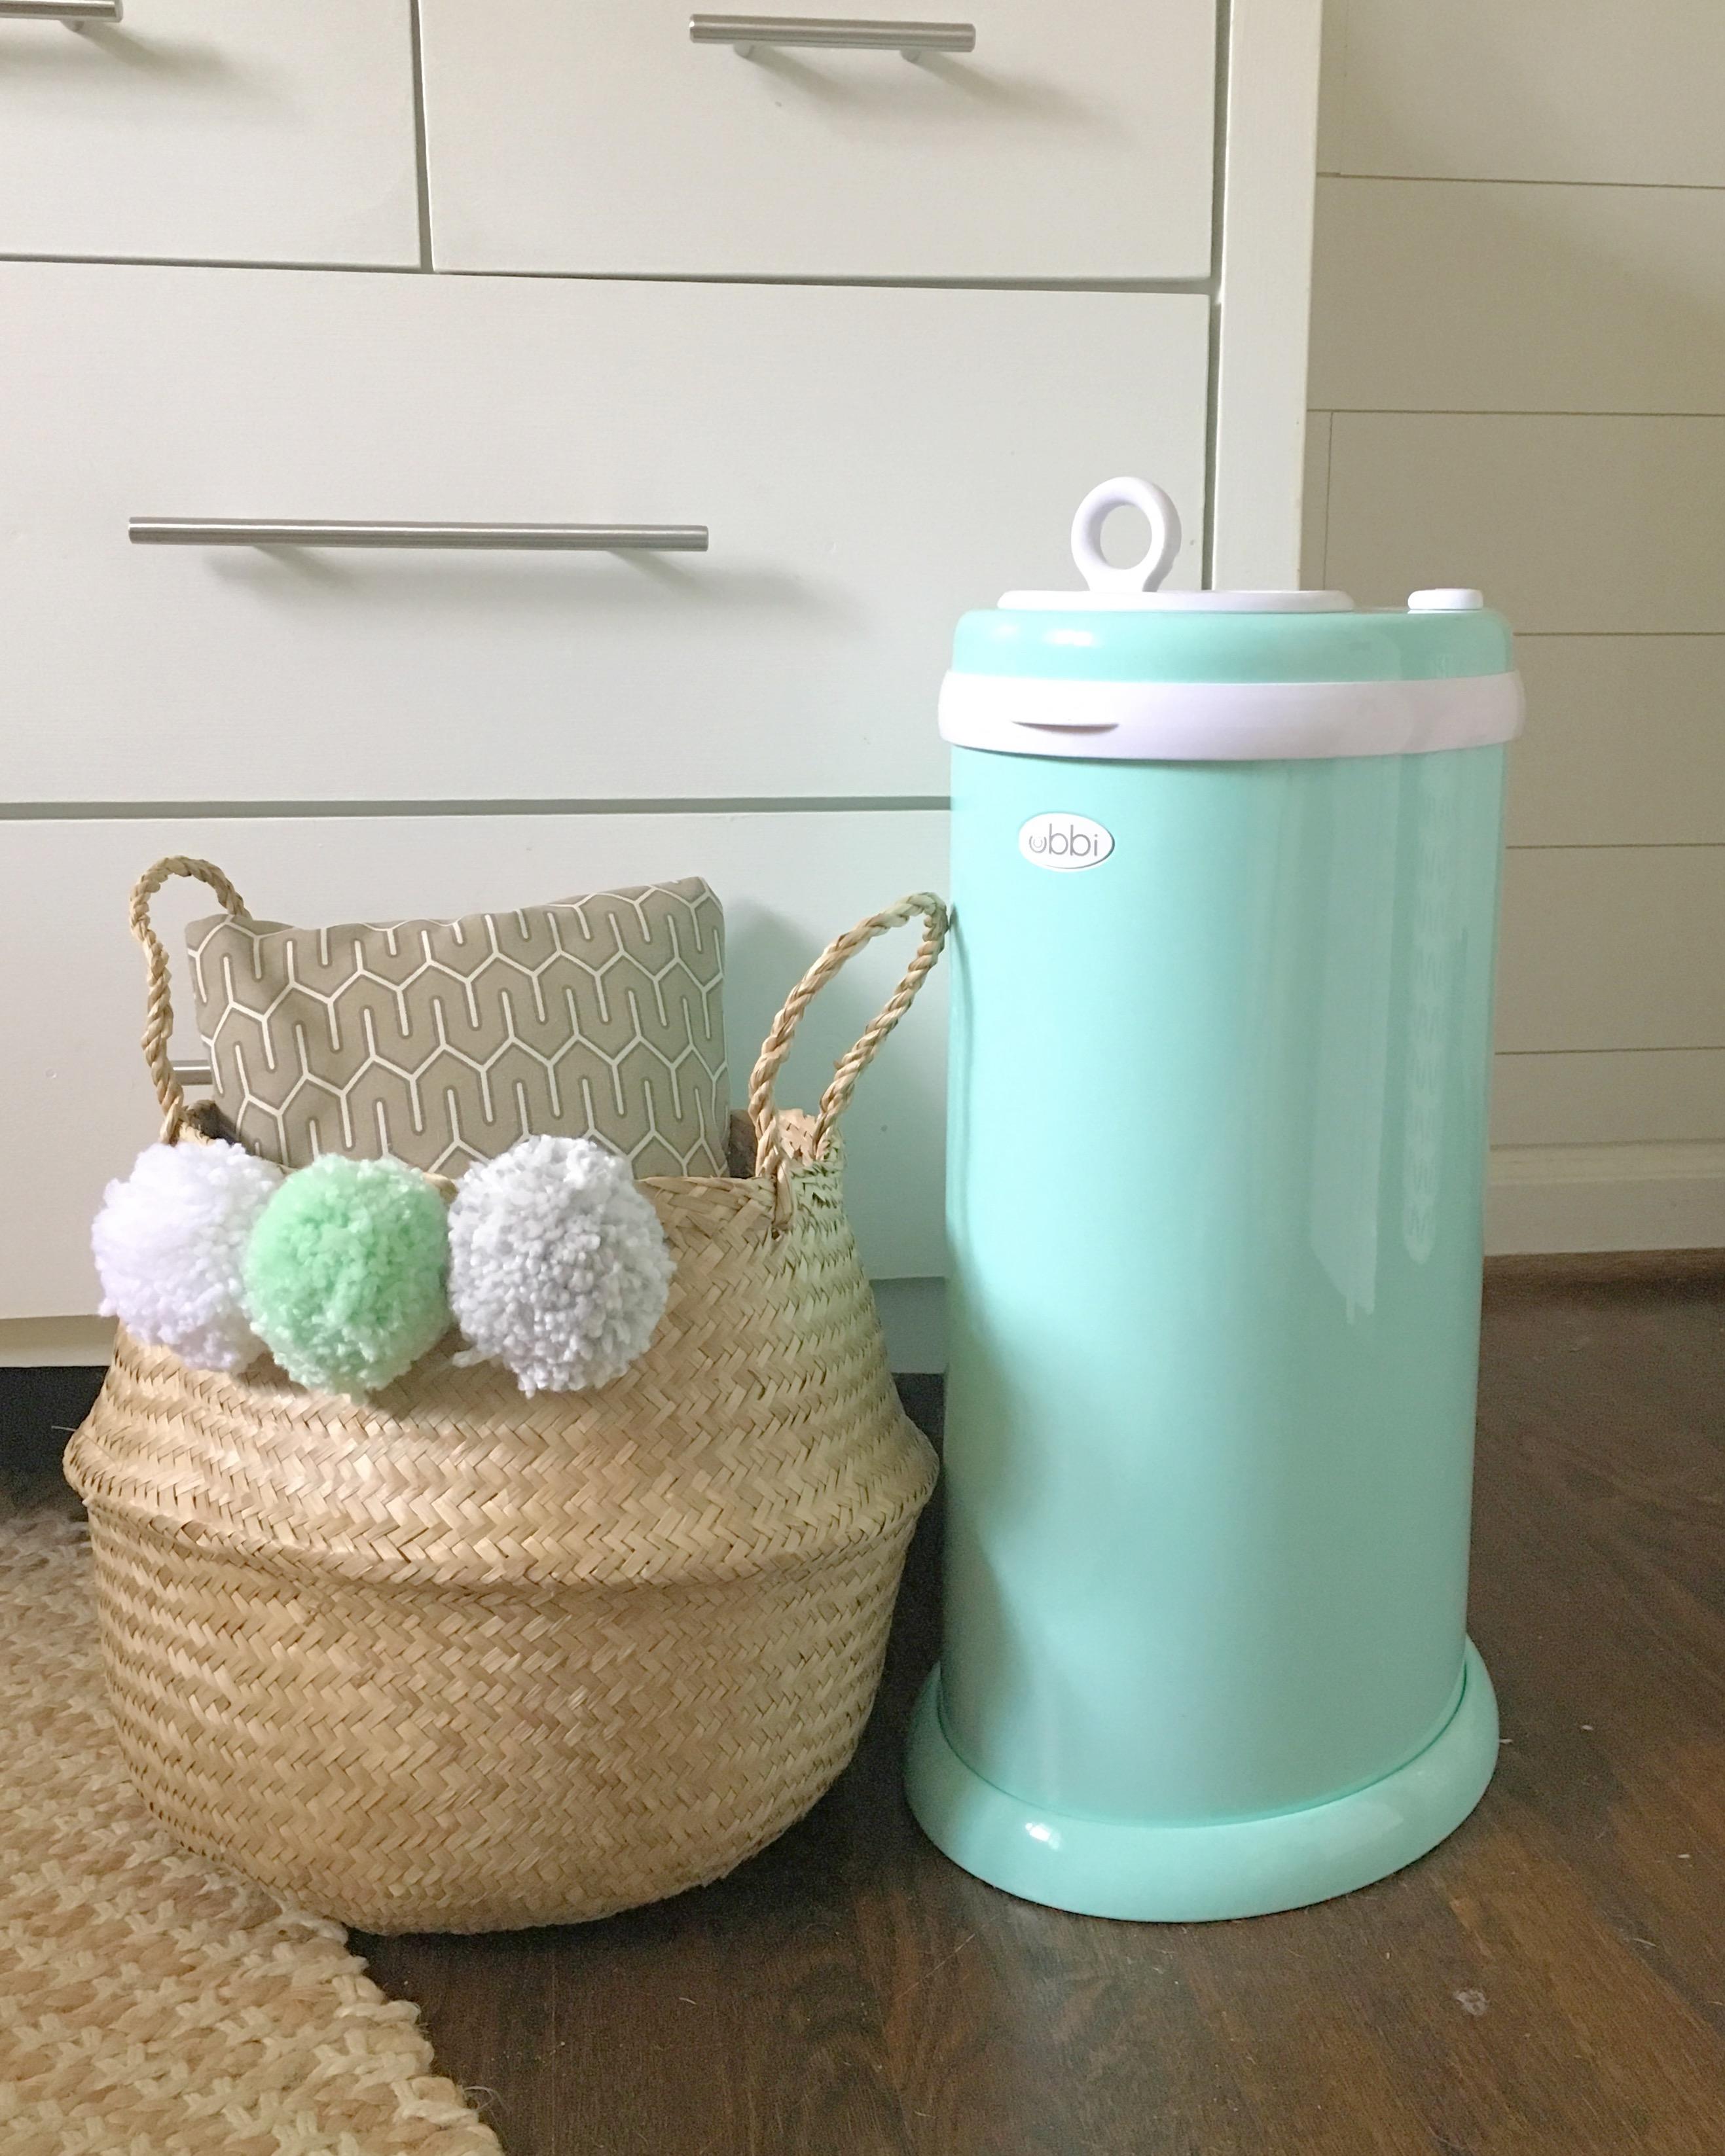 Whimsical Nursery Mint and White Nursery Ubbi Mint Diaper Pail - Project Nursery